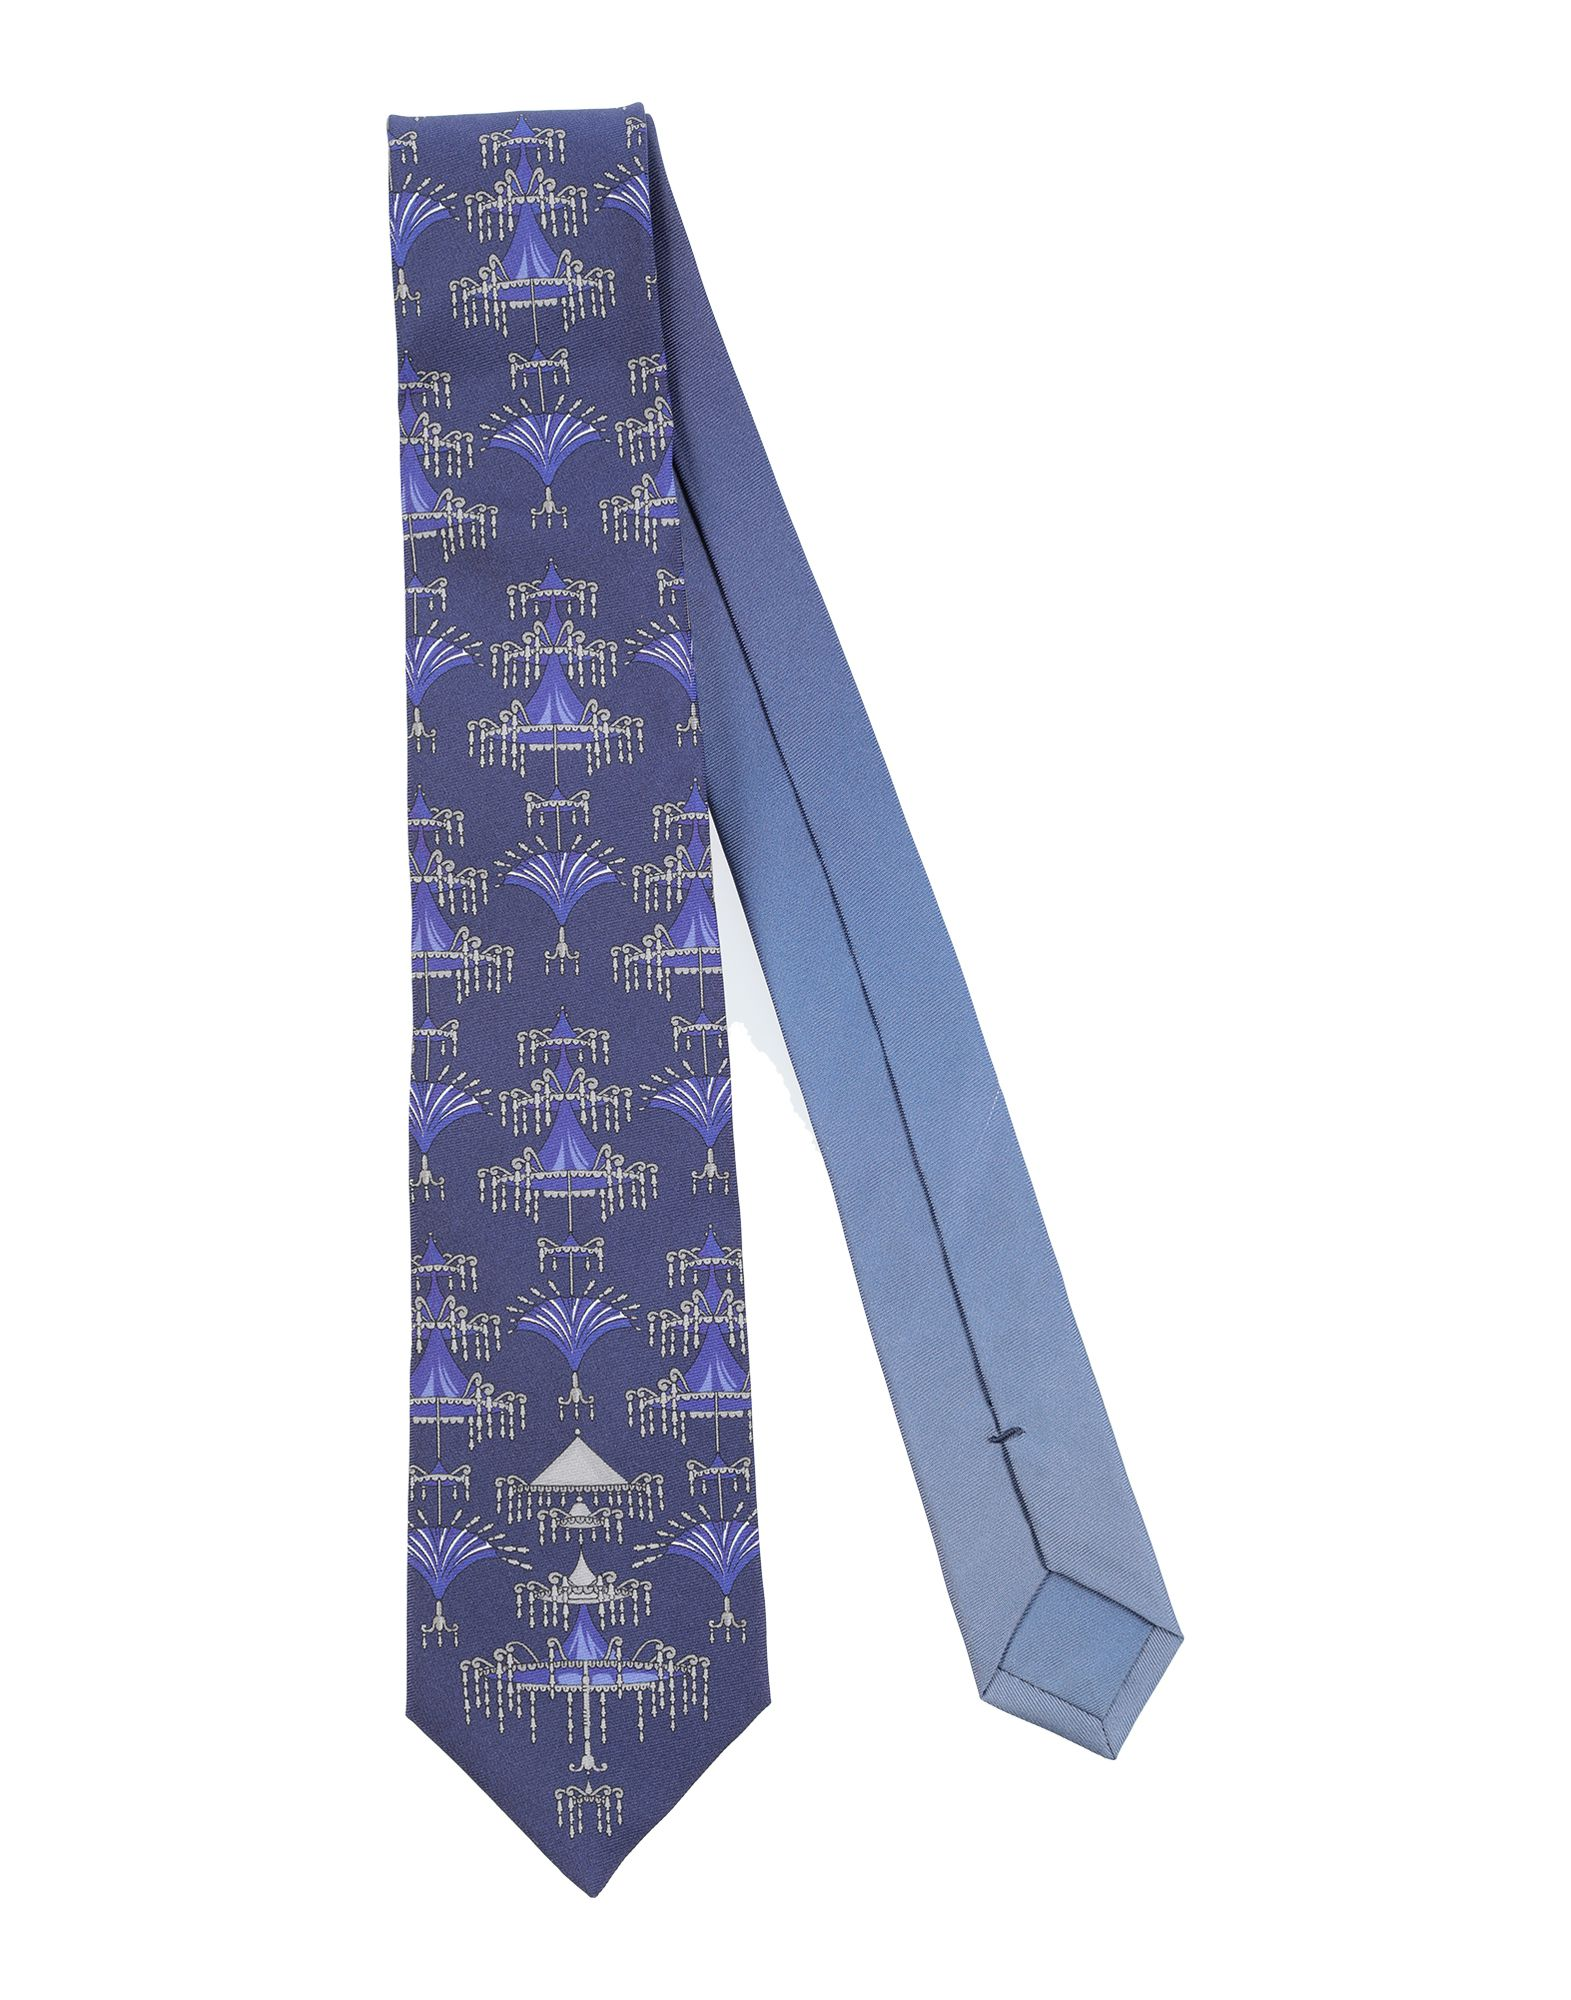 GIANNI VERSACE Галстук versace бордовый галстук в клетку внизу с логотипом versace 821752 page 3